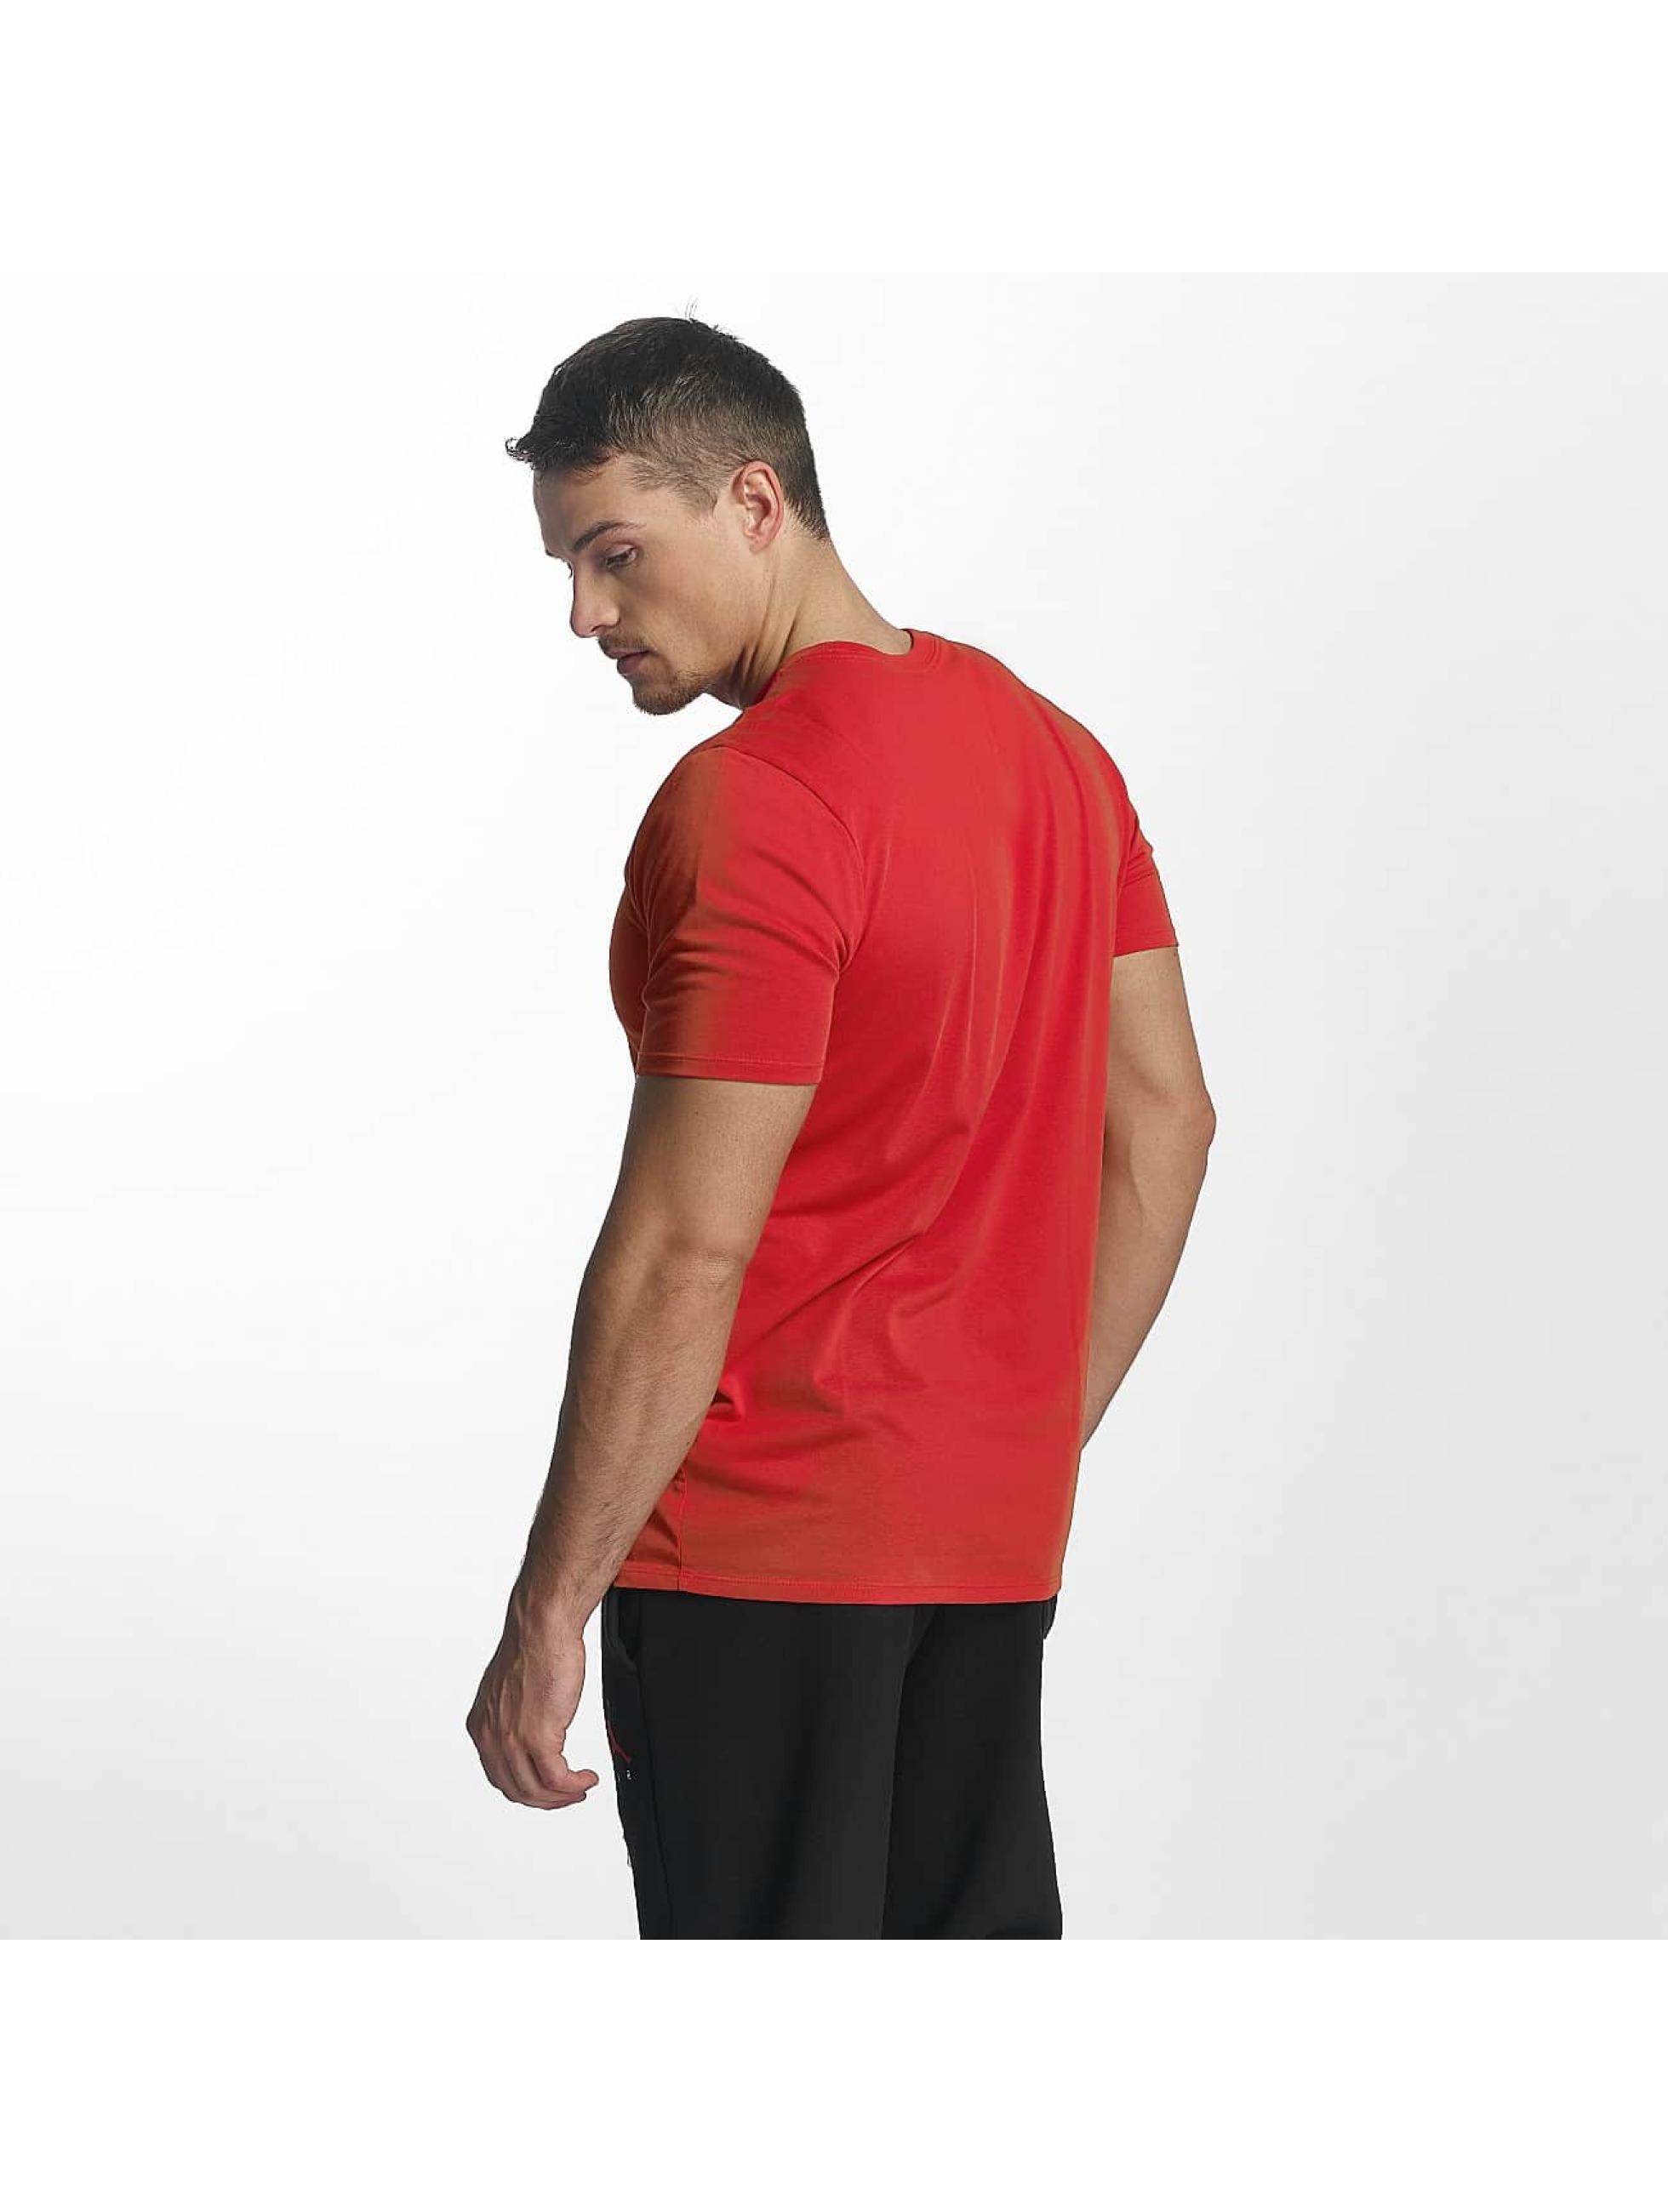 Jordan T-Shirt 23/7 Basketball Dri Fit orange